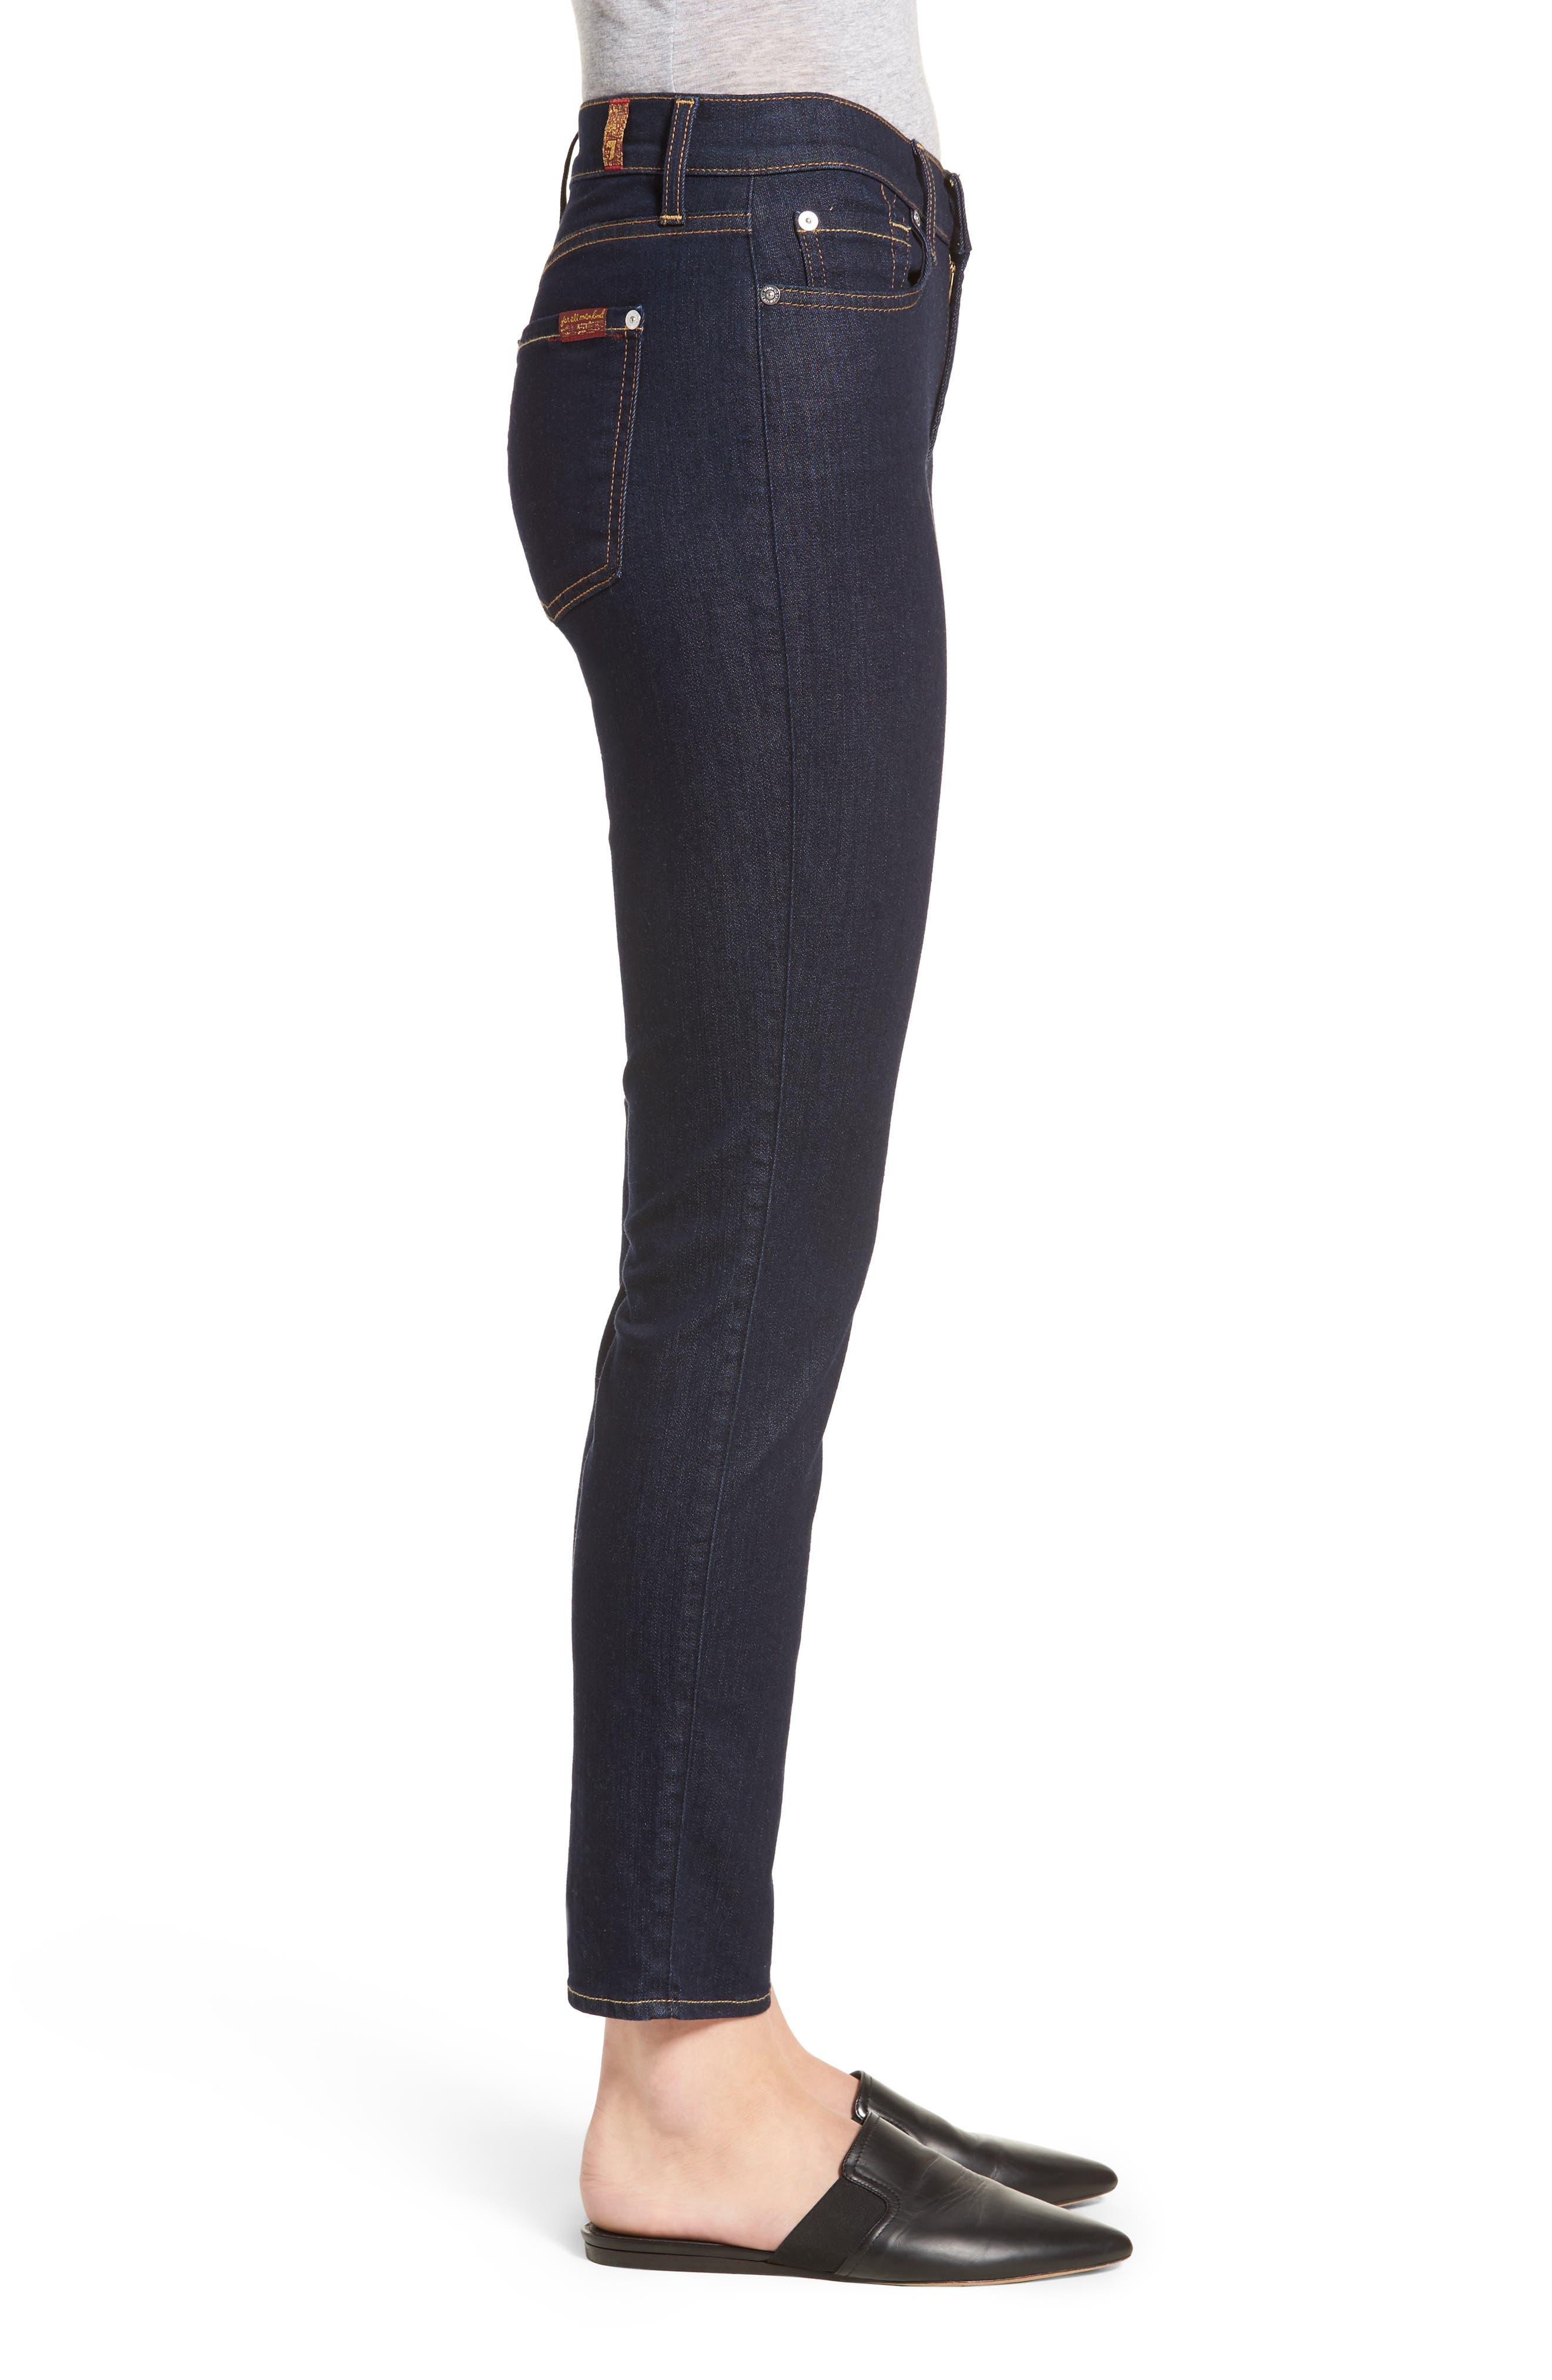 b(air) Roxanne Ankle Skinny Jeans,                             Alternate thumbnail 3, color,                             401